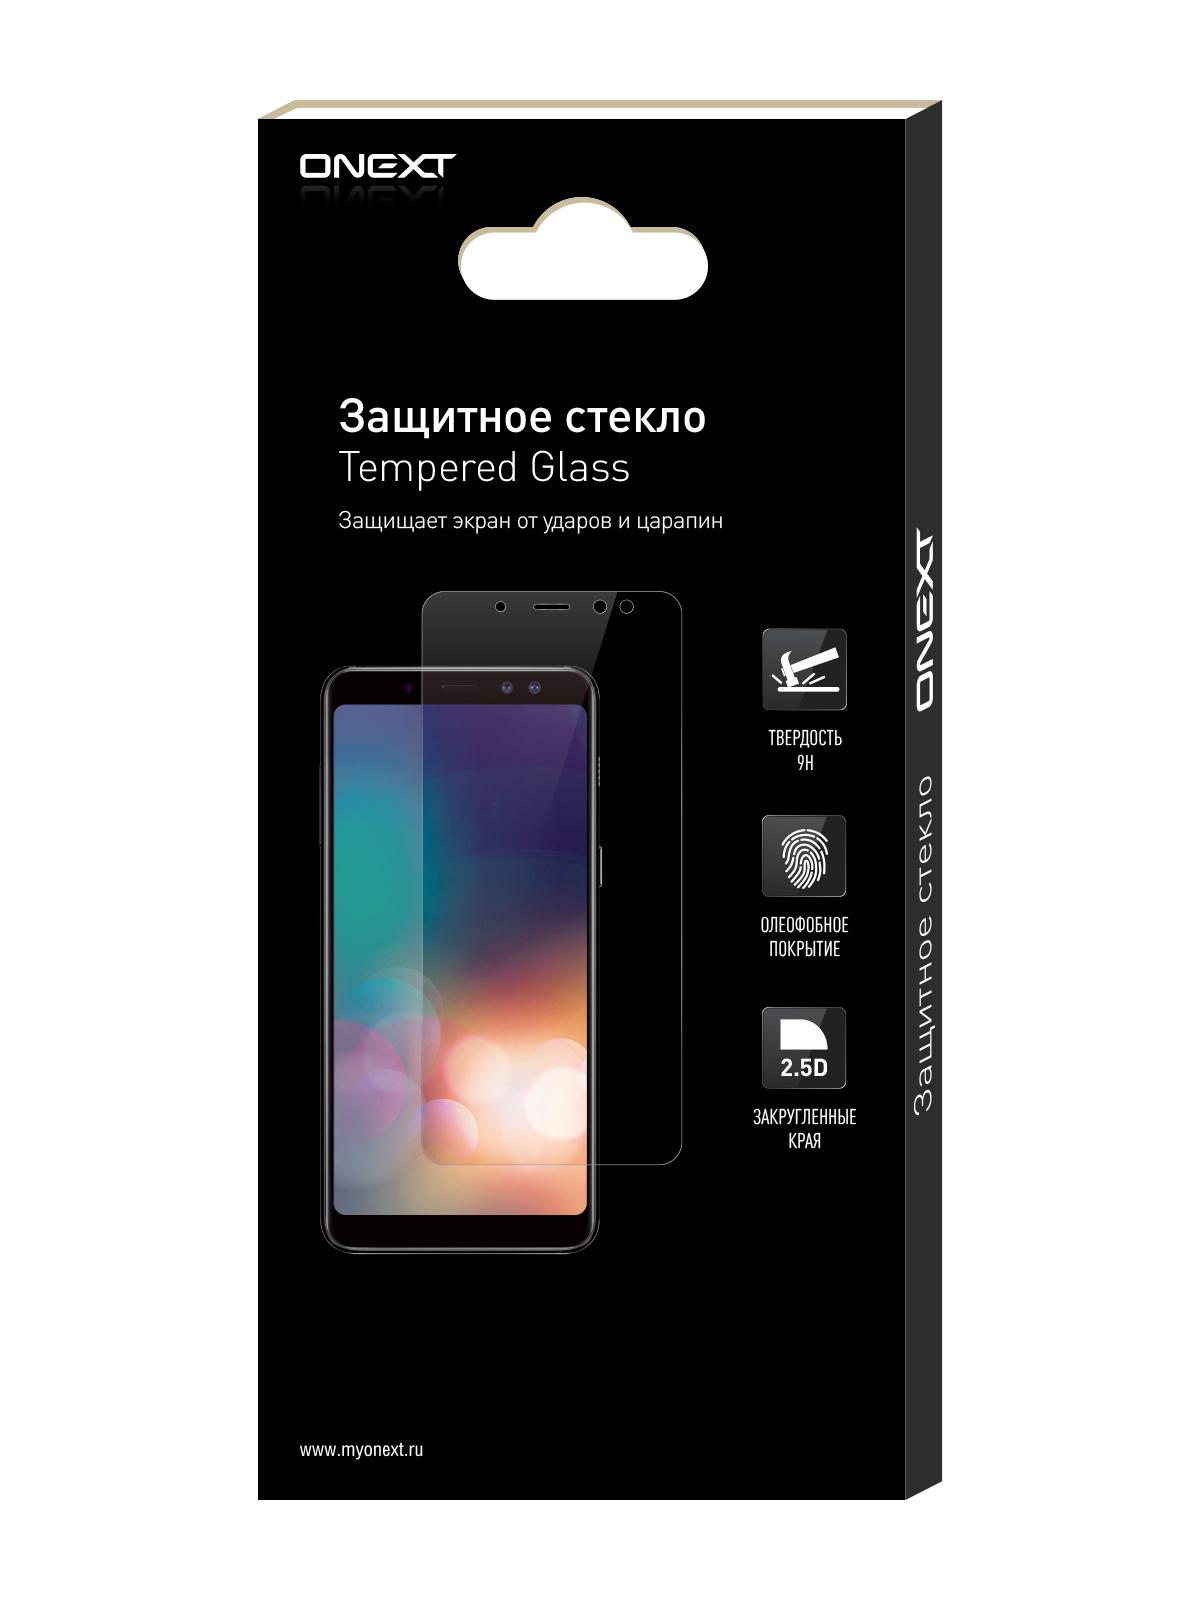 Защитное стекло ONEXT для Xiaomi Redmi Note 4X